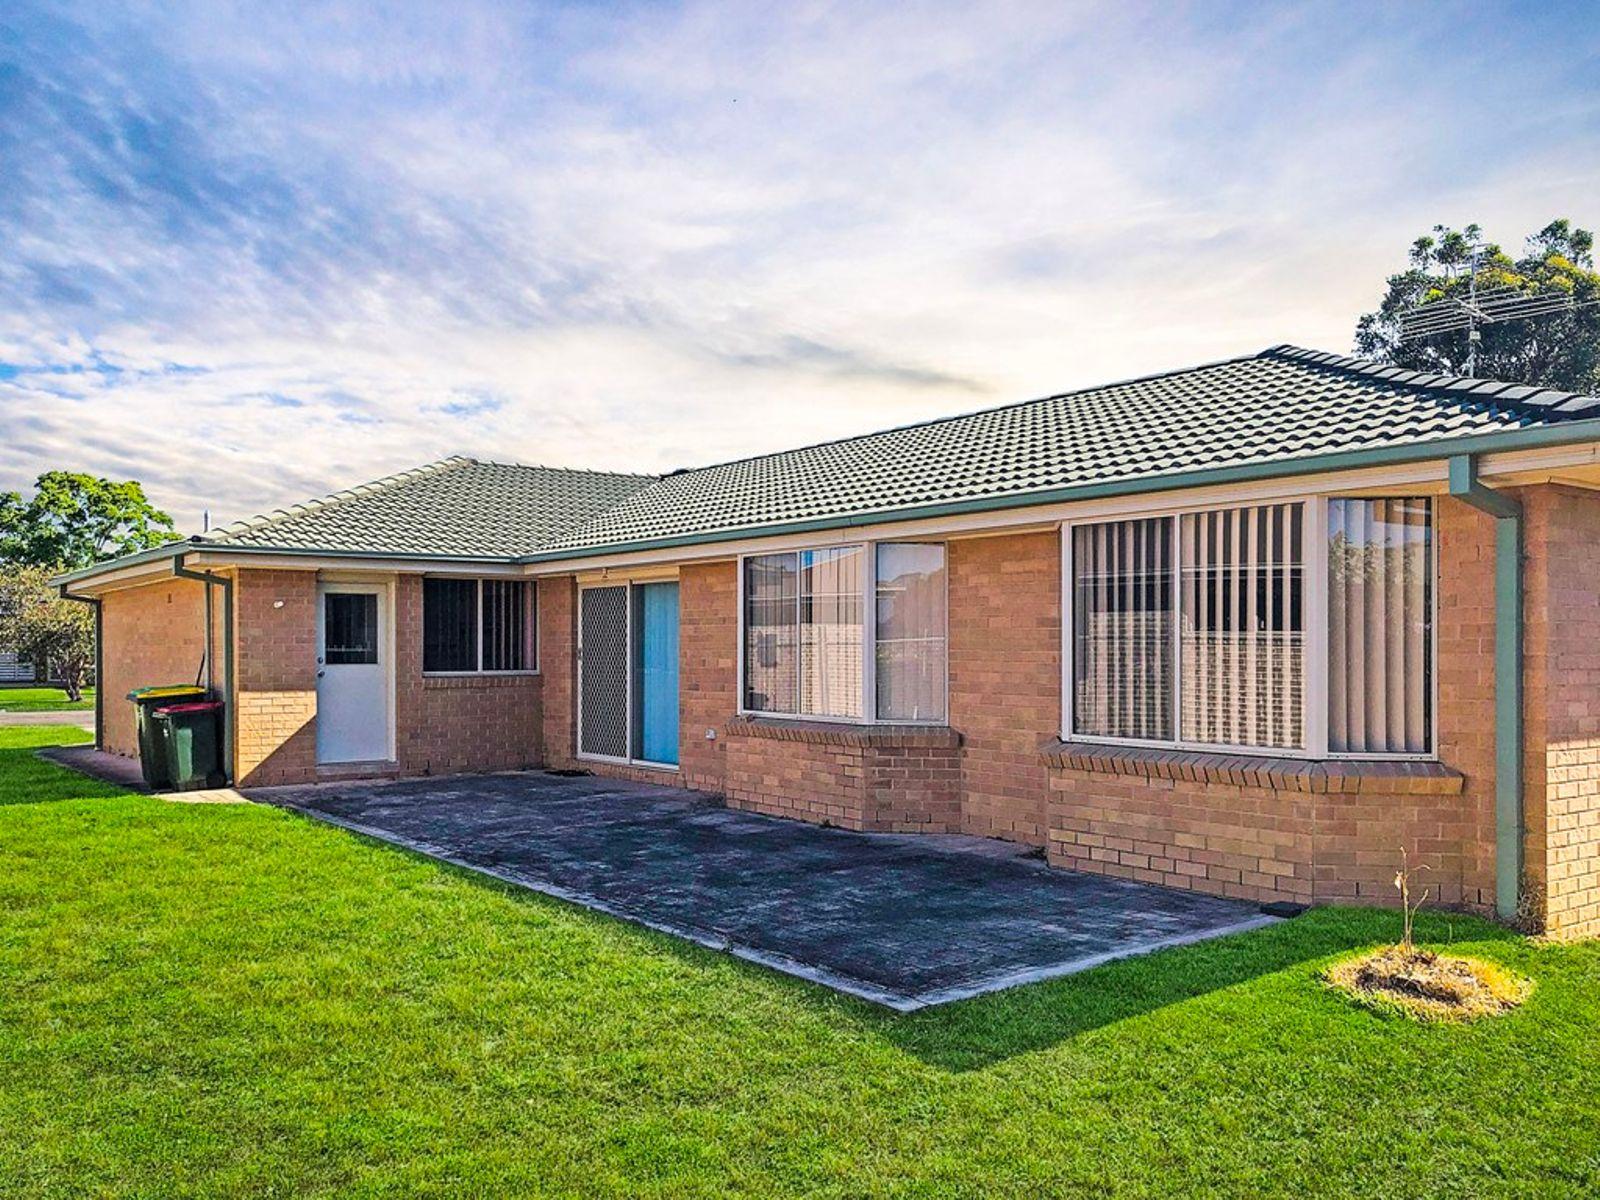 6 Penn Drive, Tea Gardens, NSW 2324